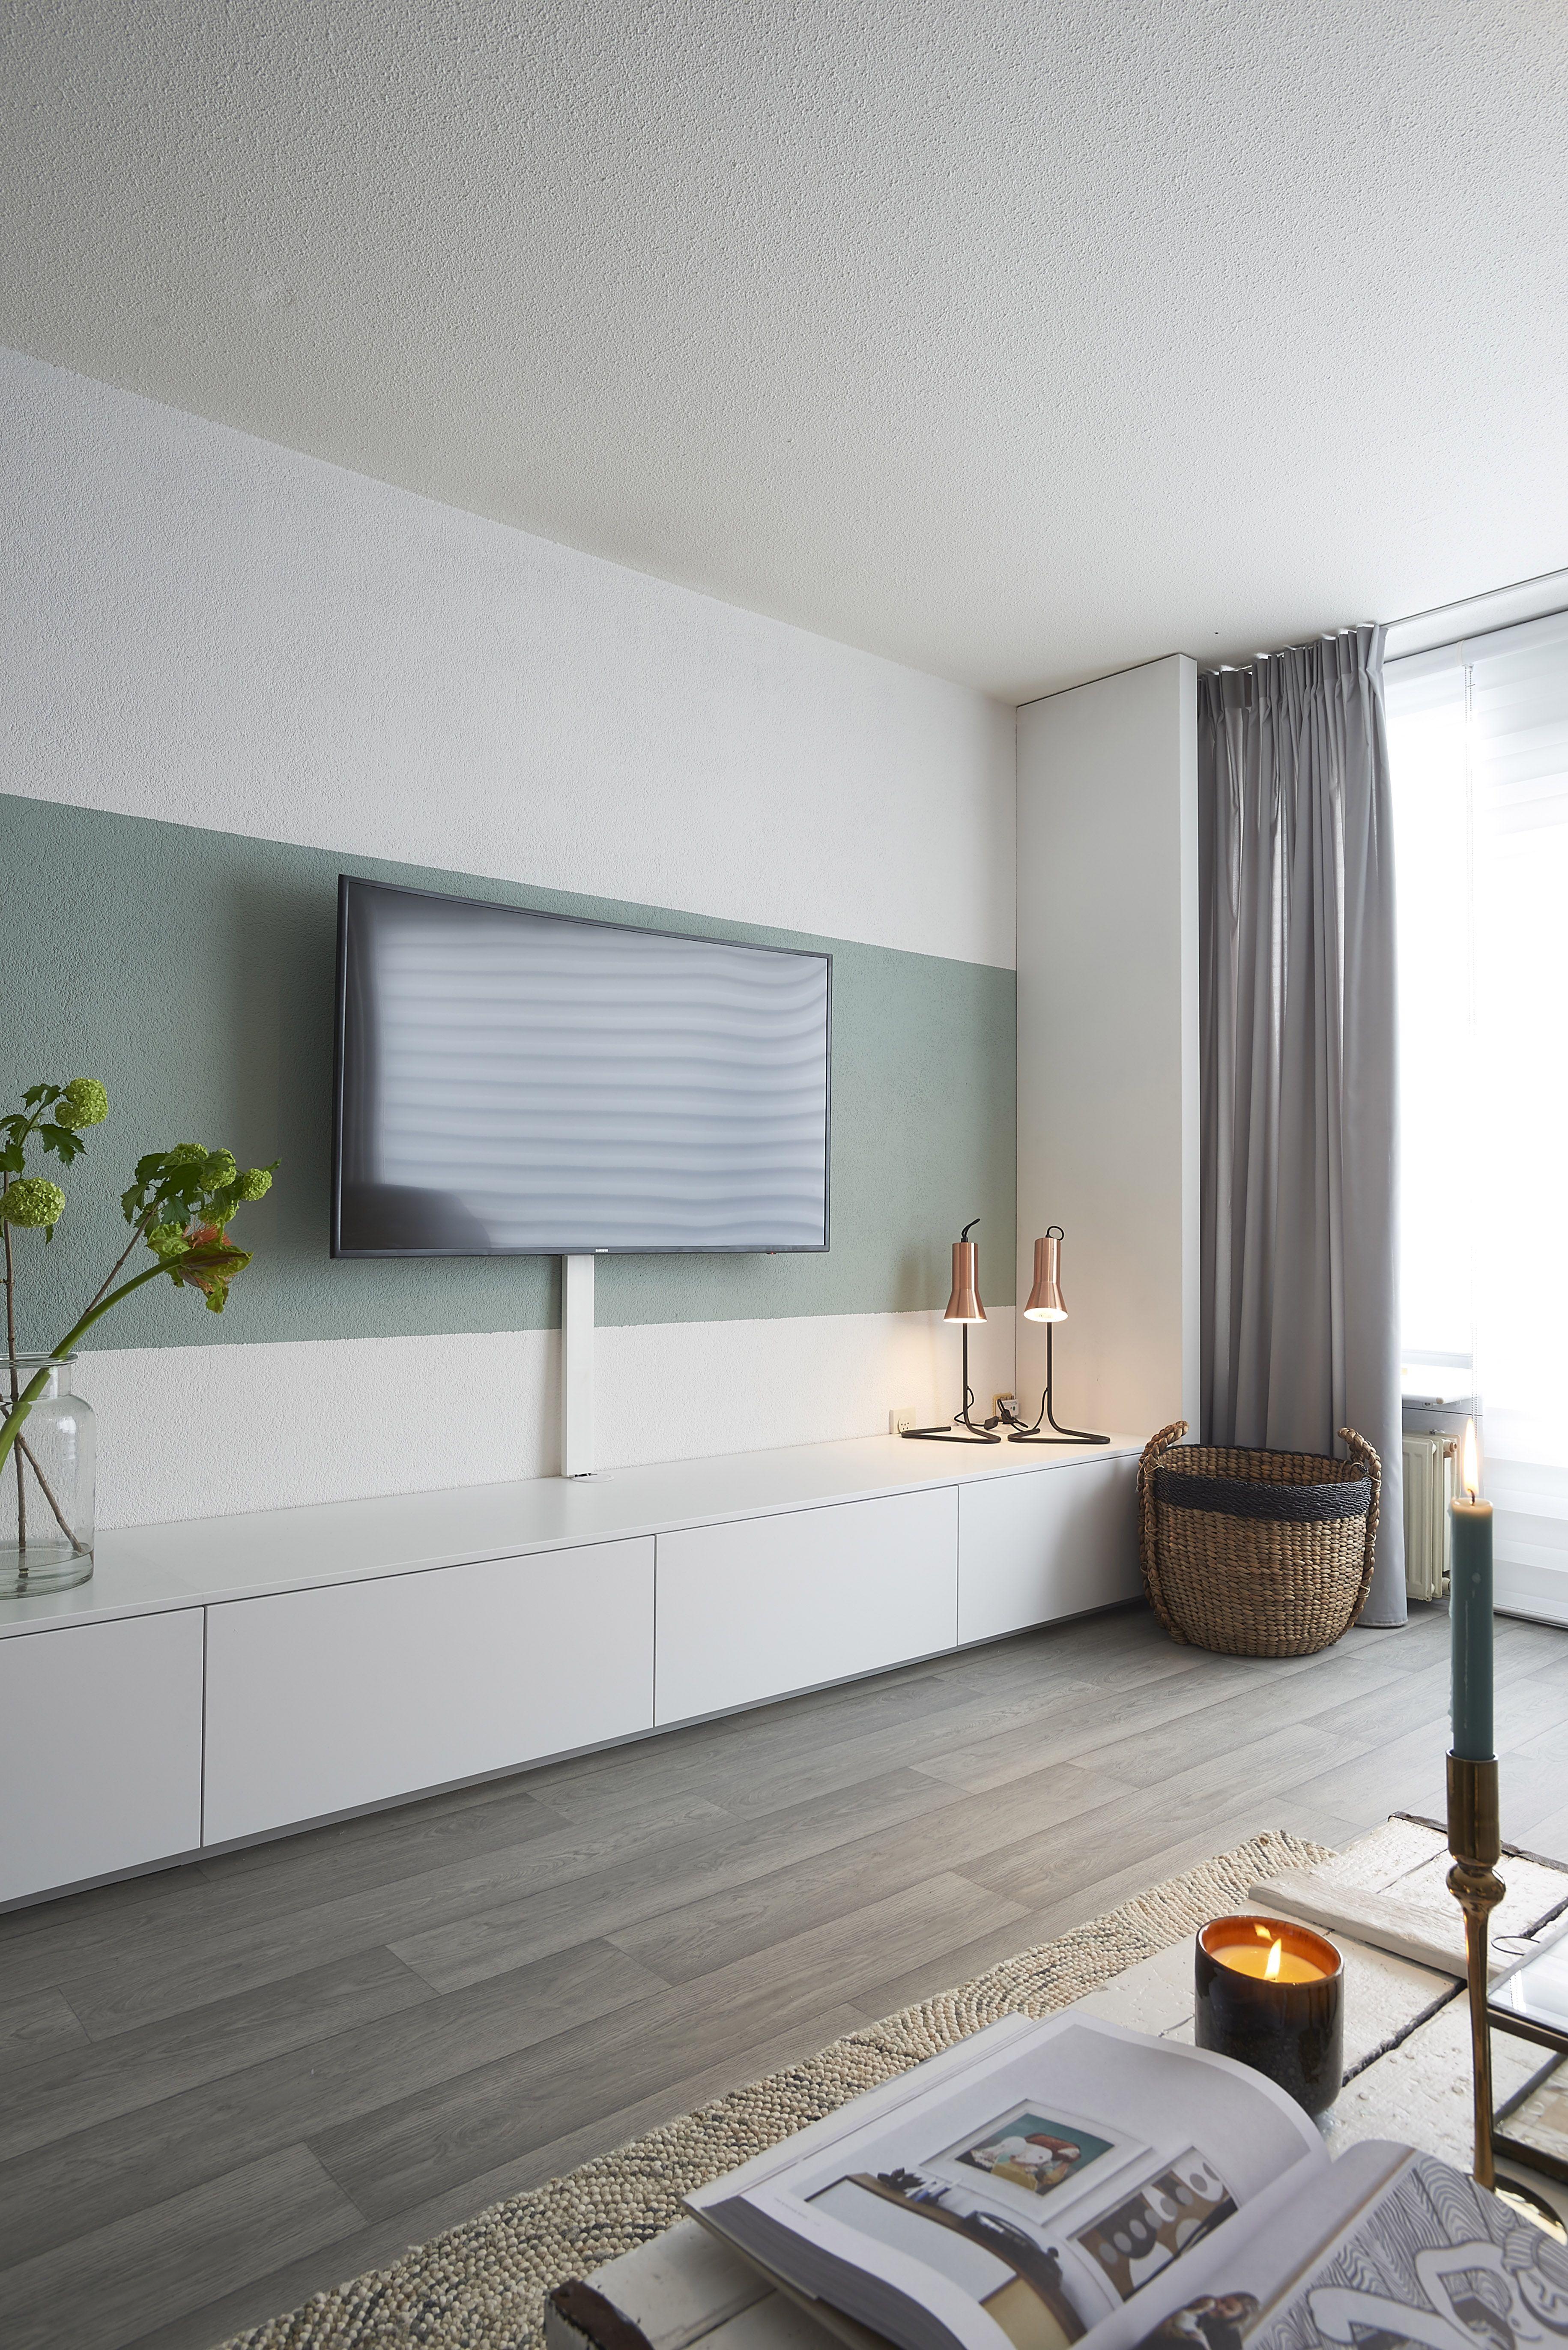 Pin by Brigitte van Rij on Decorating | Interior / Living Room Decor ...